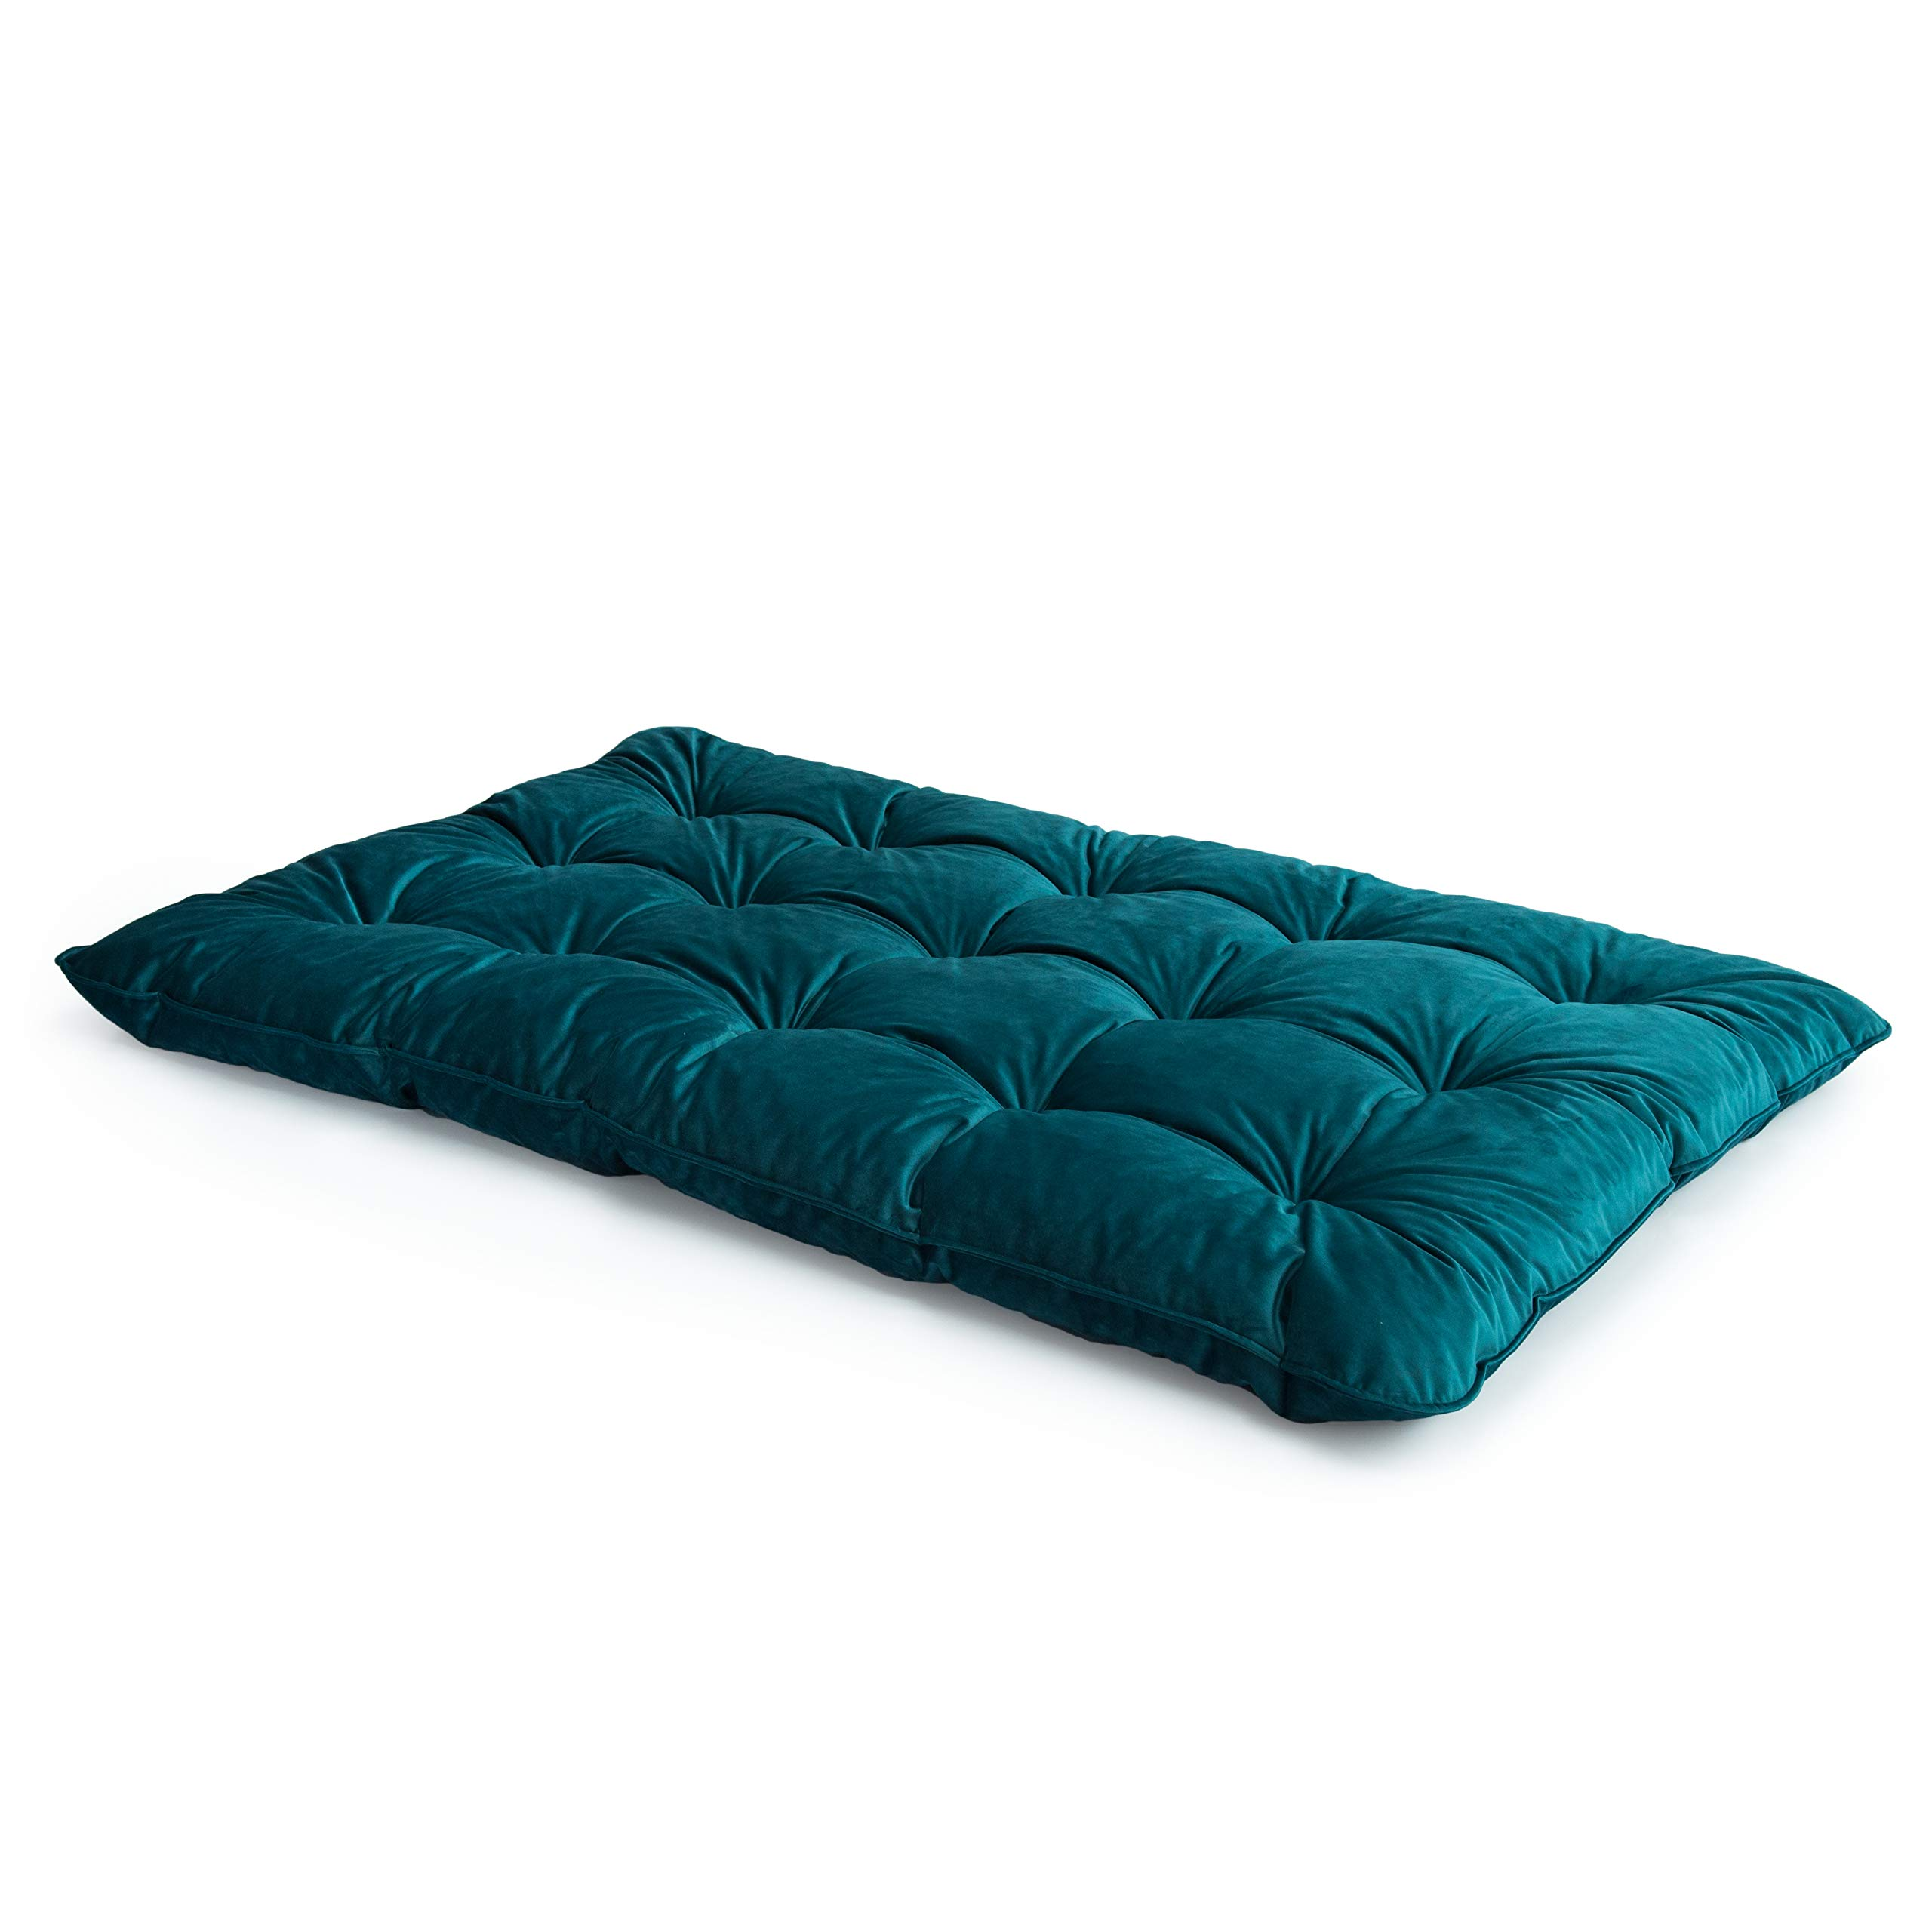 size 40 2e69c befe1 Loft 25® Velvet Fabric Mallard Foam Crumb Tufted Double Futon Mattress -  Best Futons